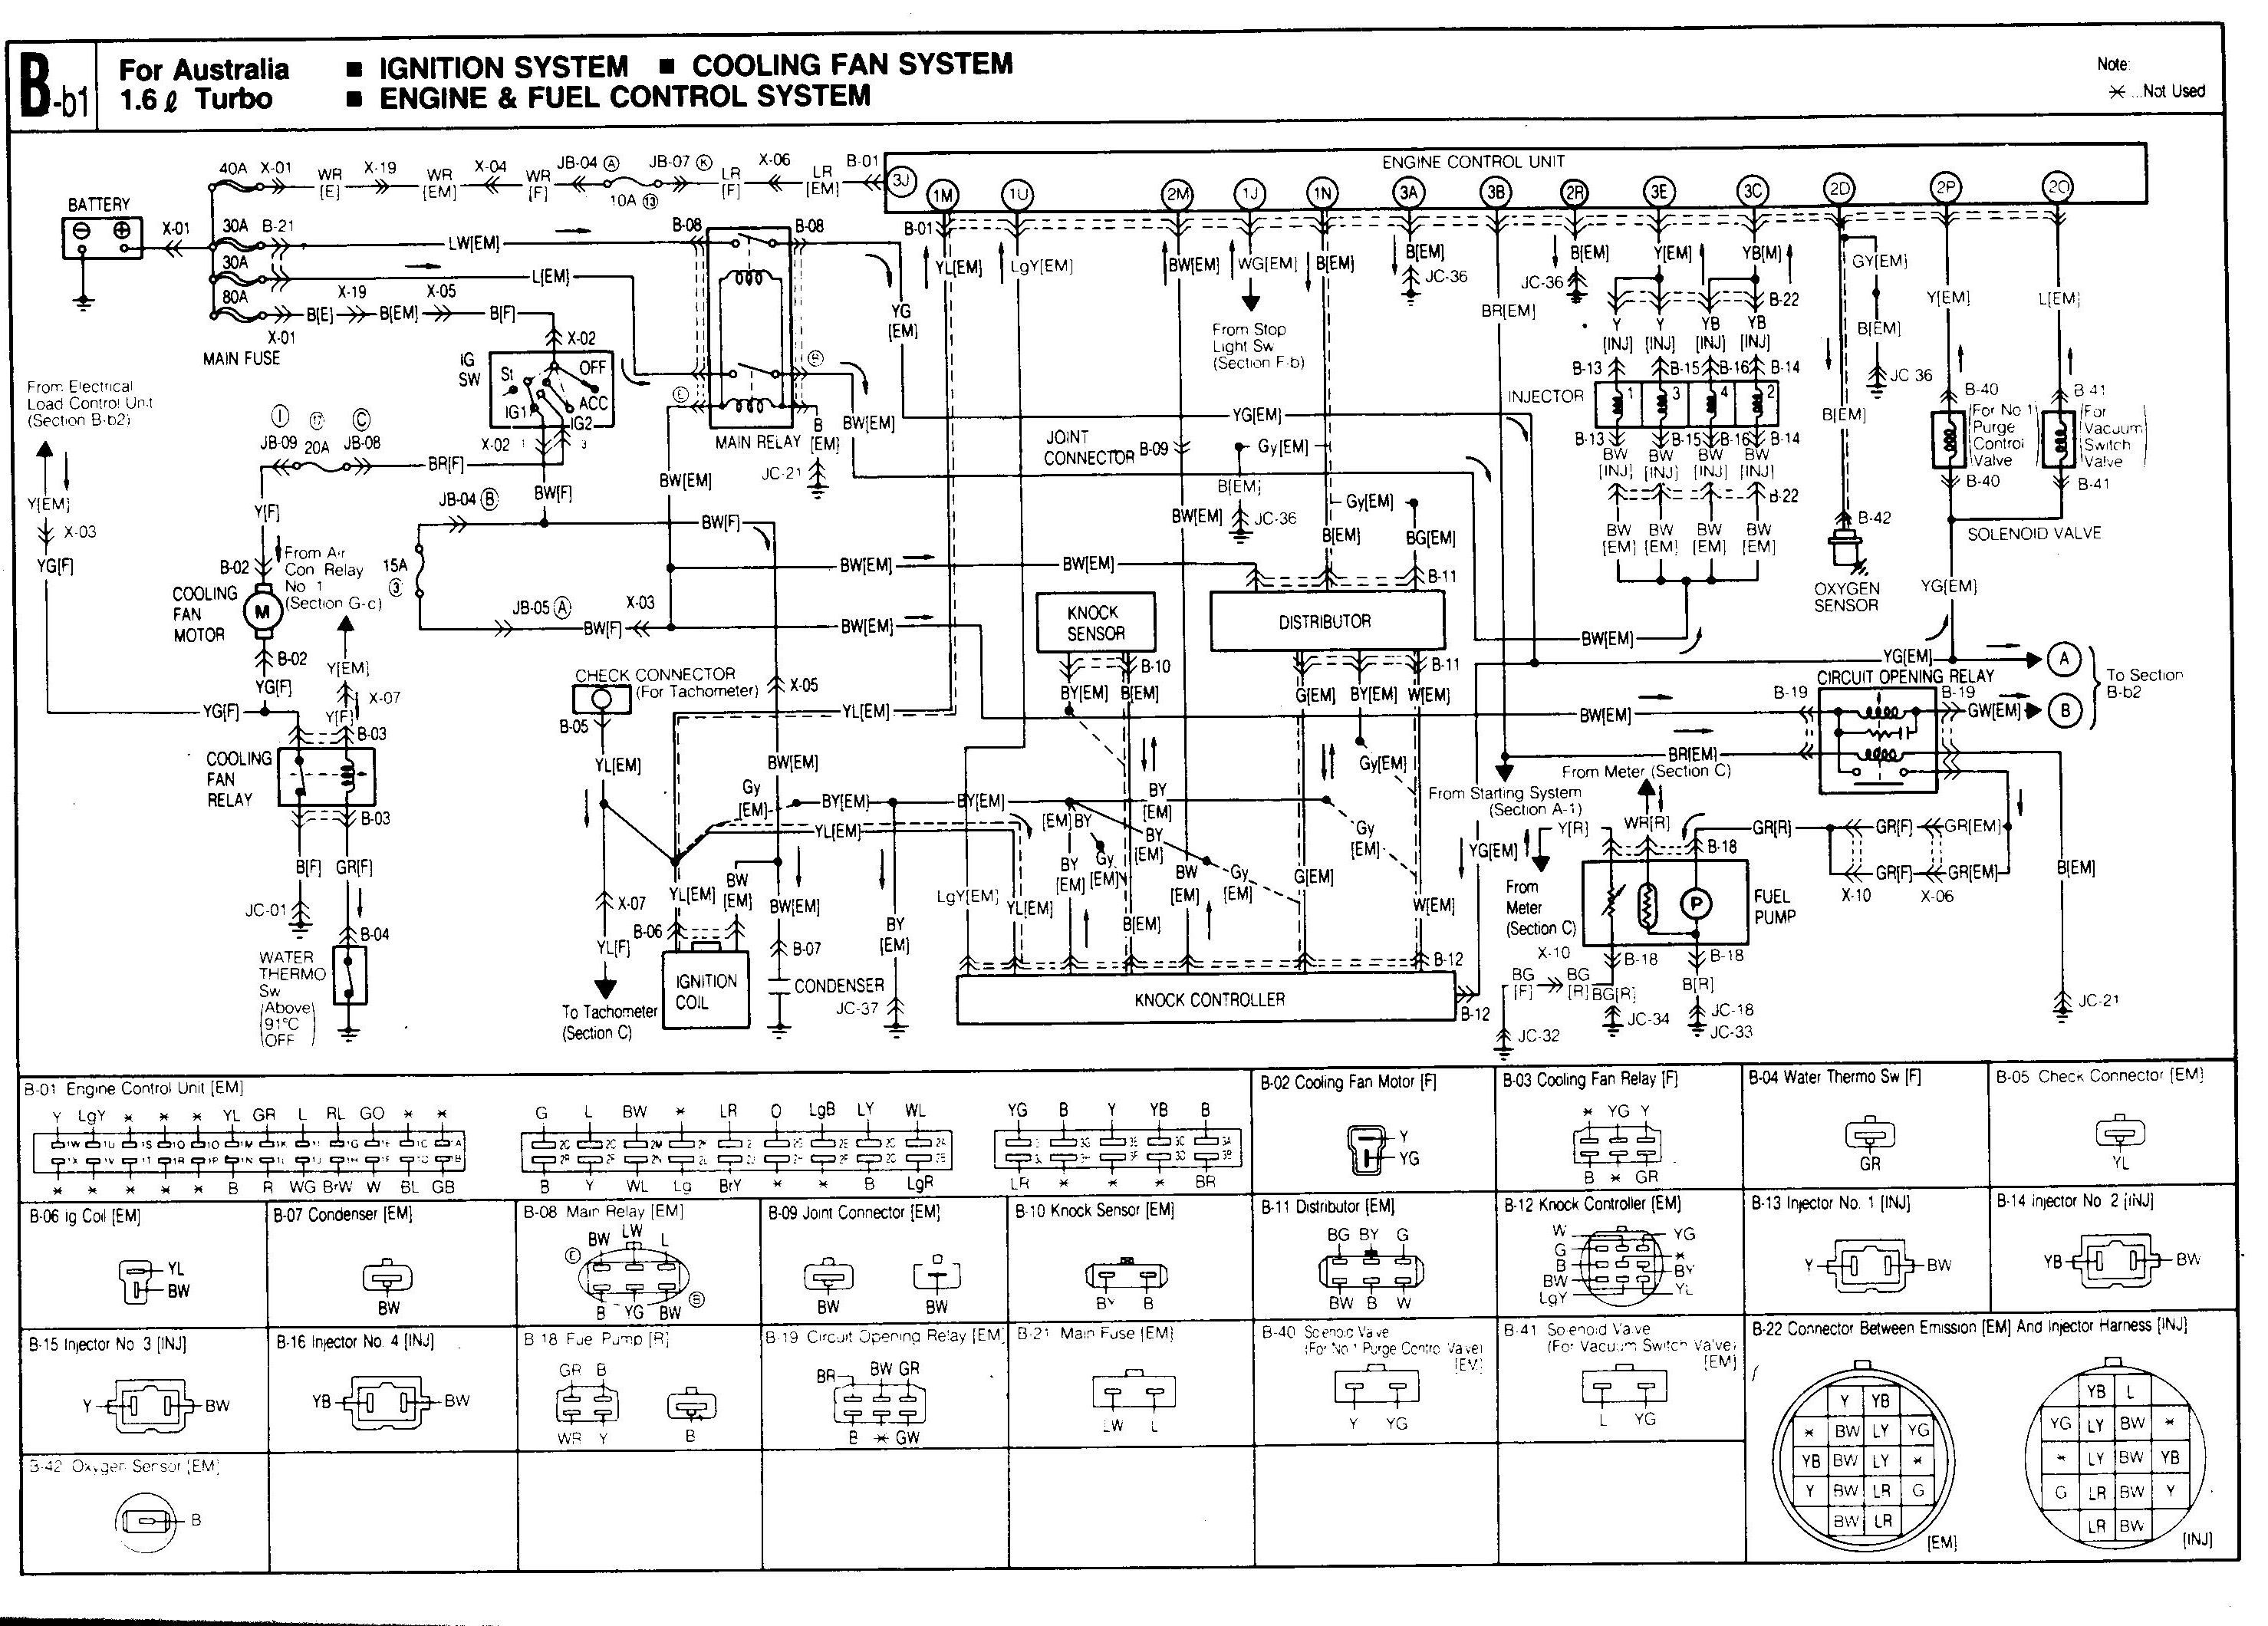 hight resolution of mazda gf wiring diagram with basic pics 626 mazda pinterest rh pinterest com 2002 mazda 626 engine diagram 1995 mazda 626 fuse diagram